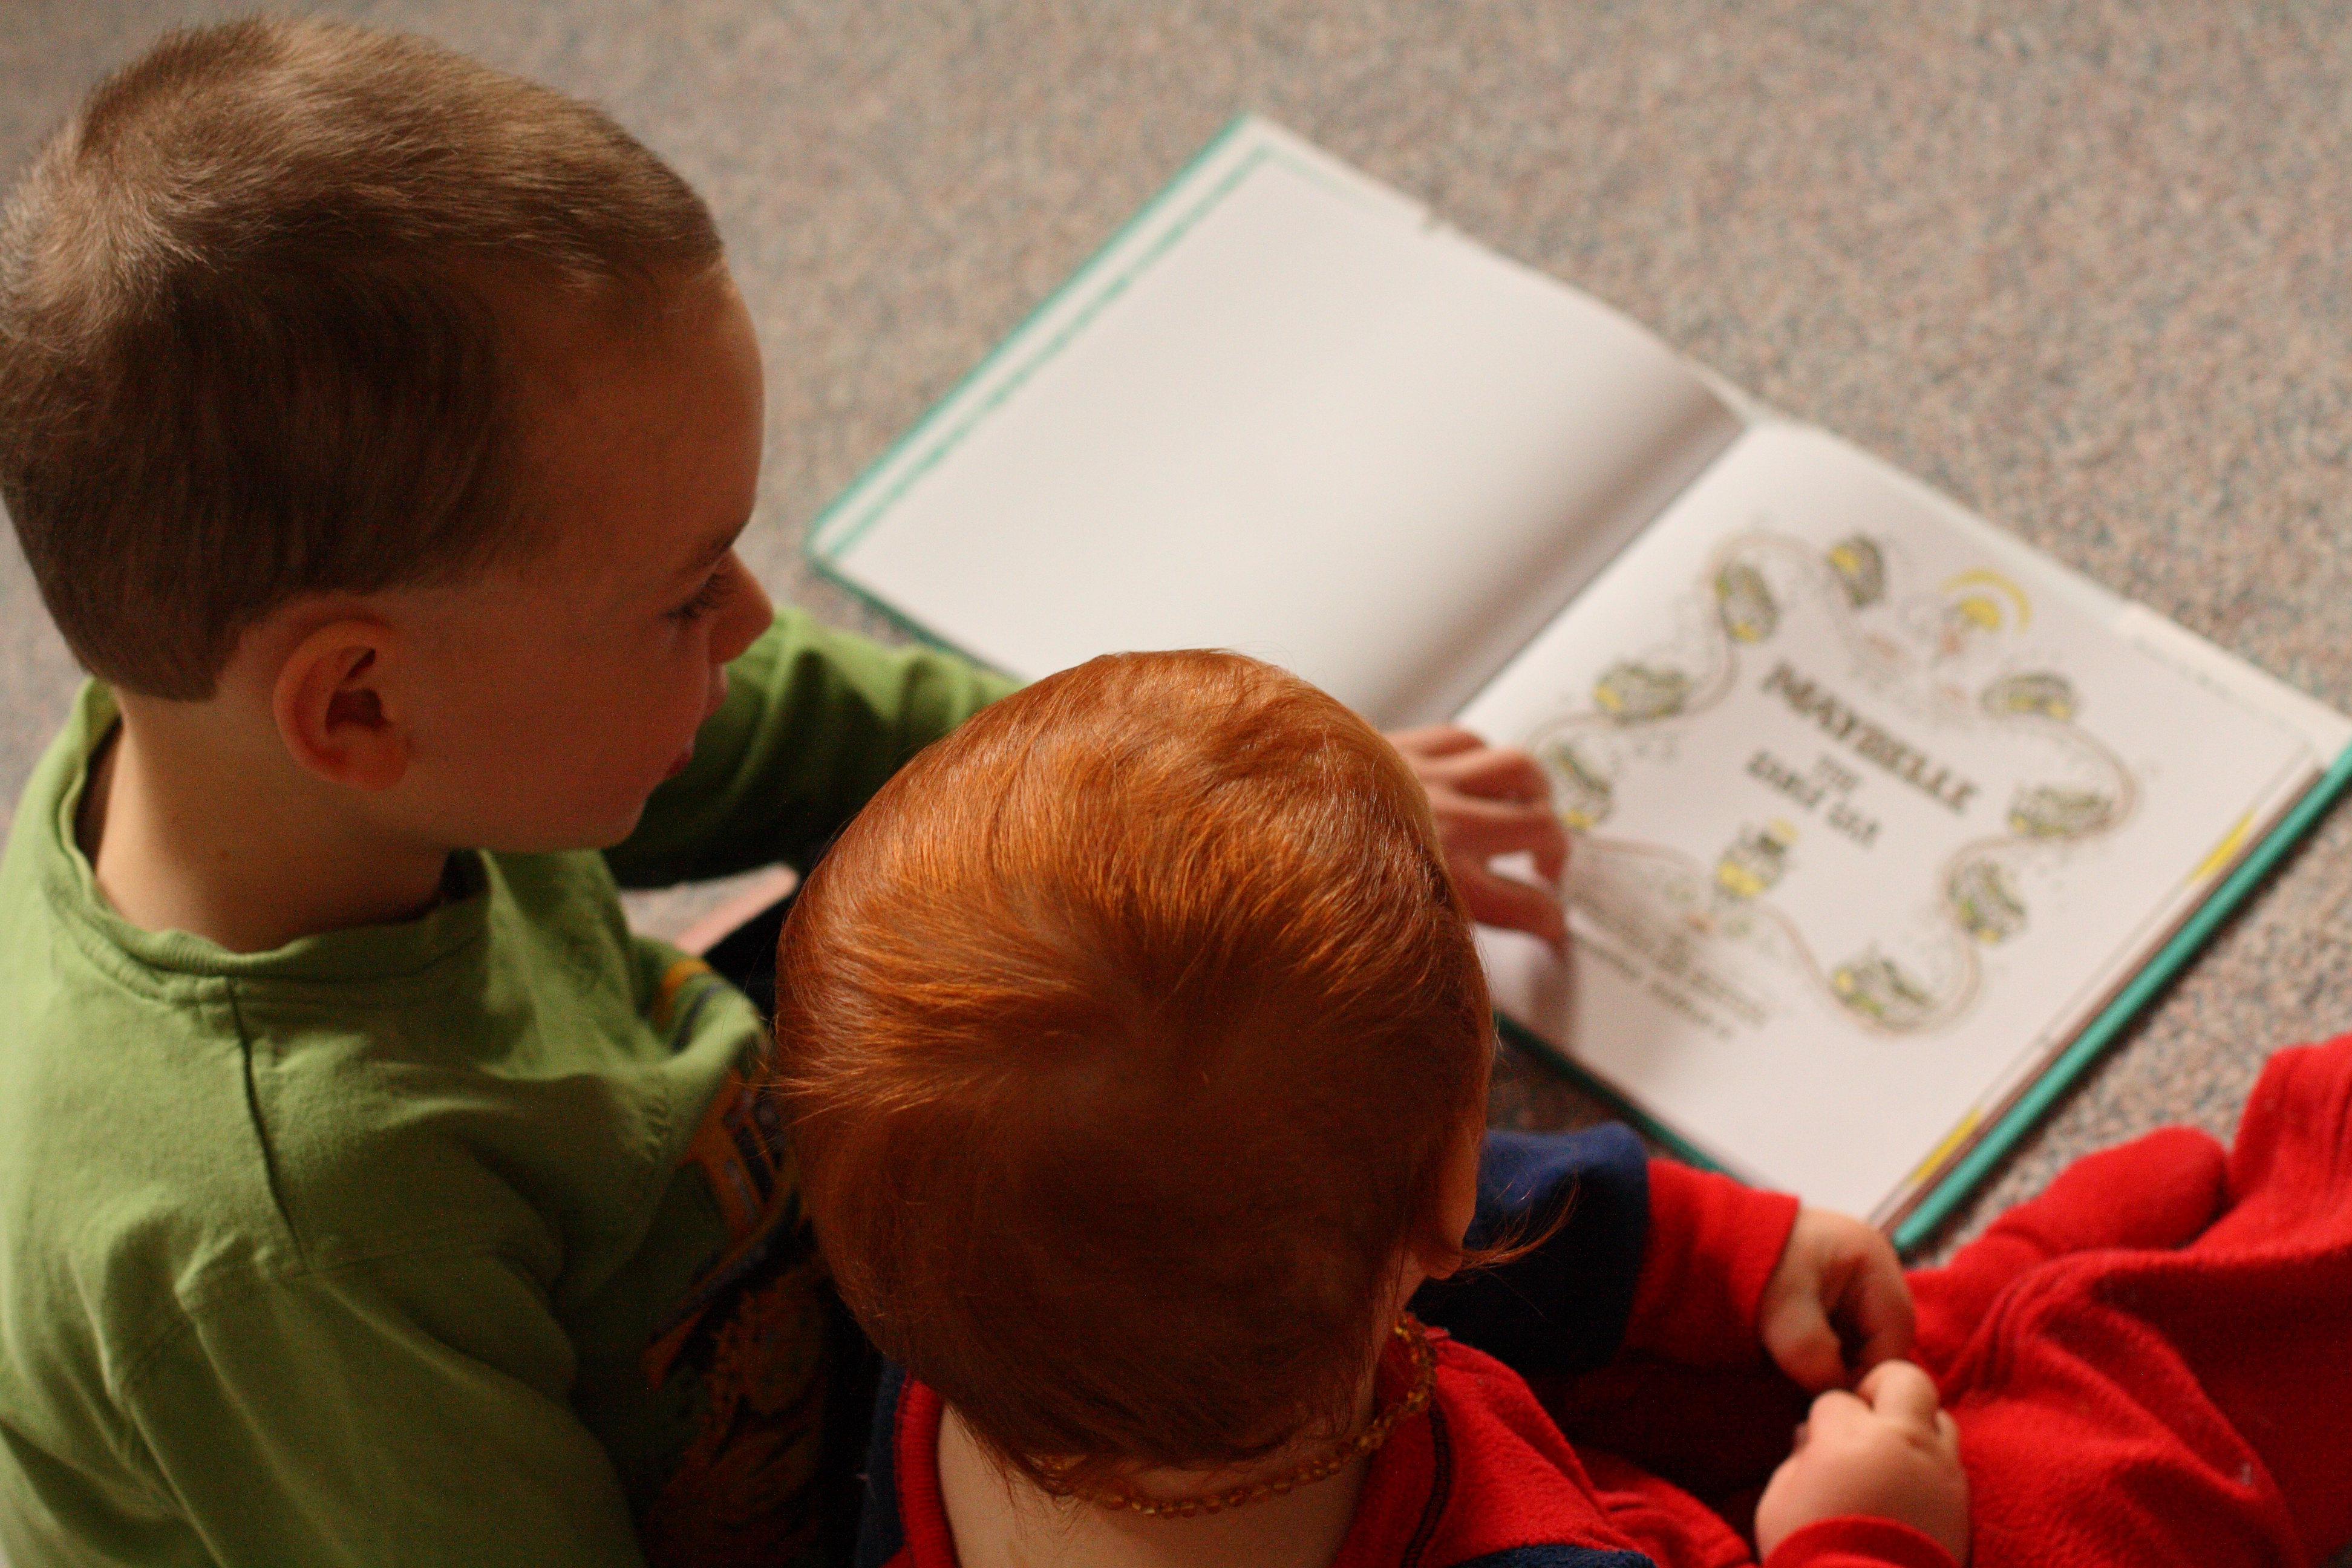 10 Must Do's in Your Catholic Preschool